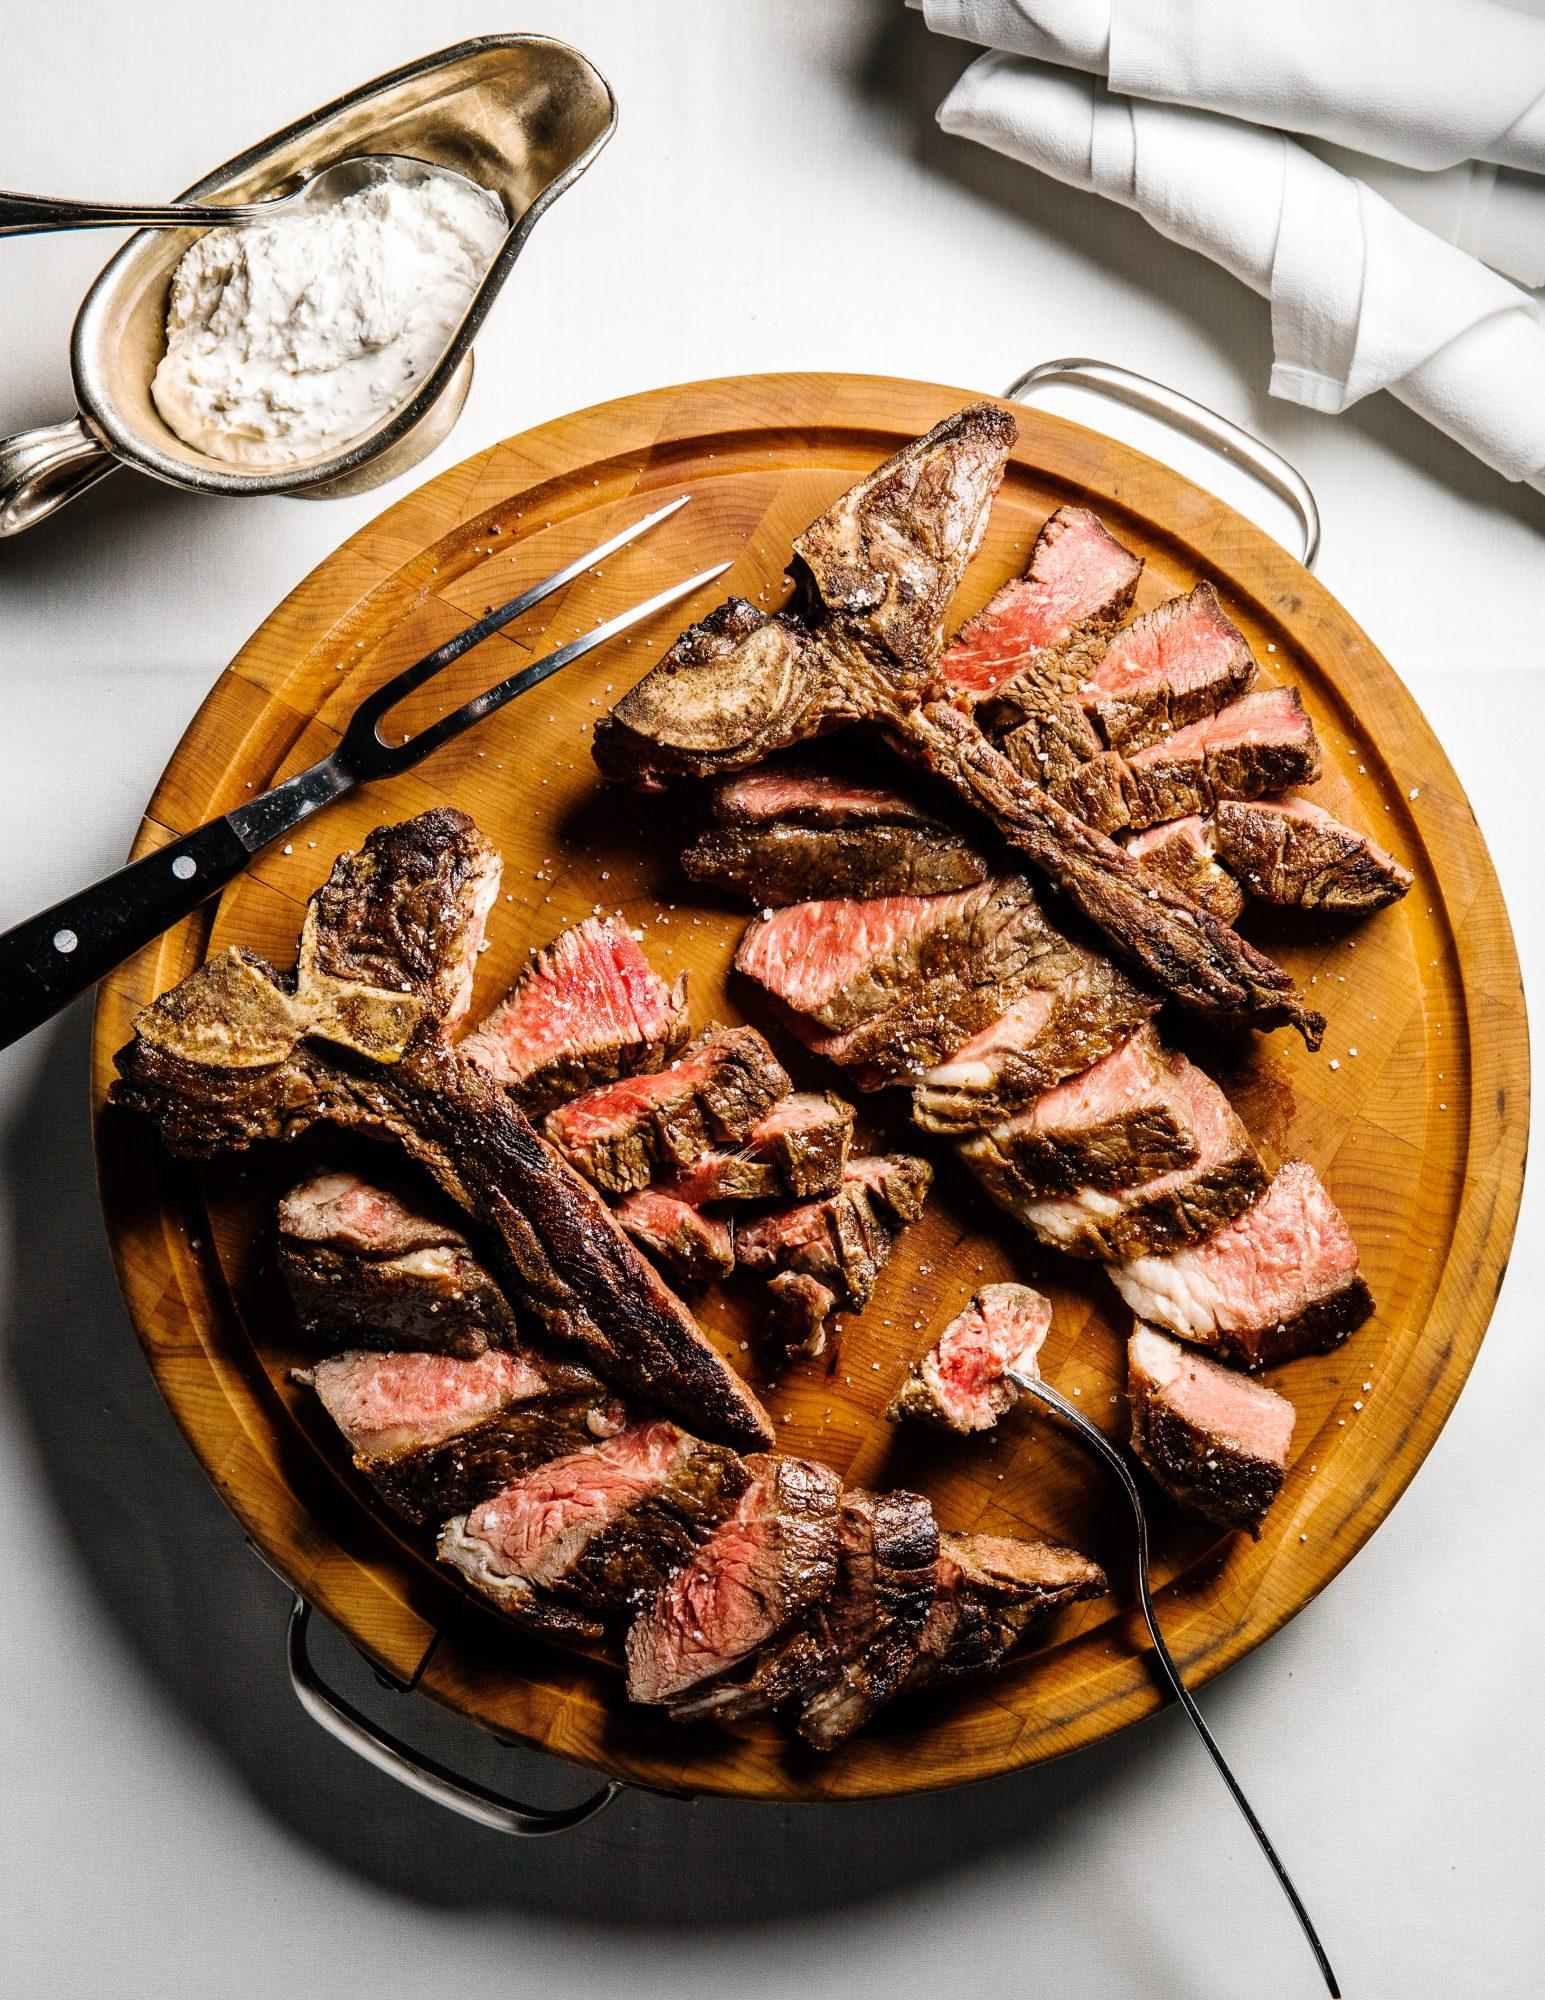 Grilled Steak Platter